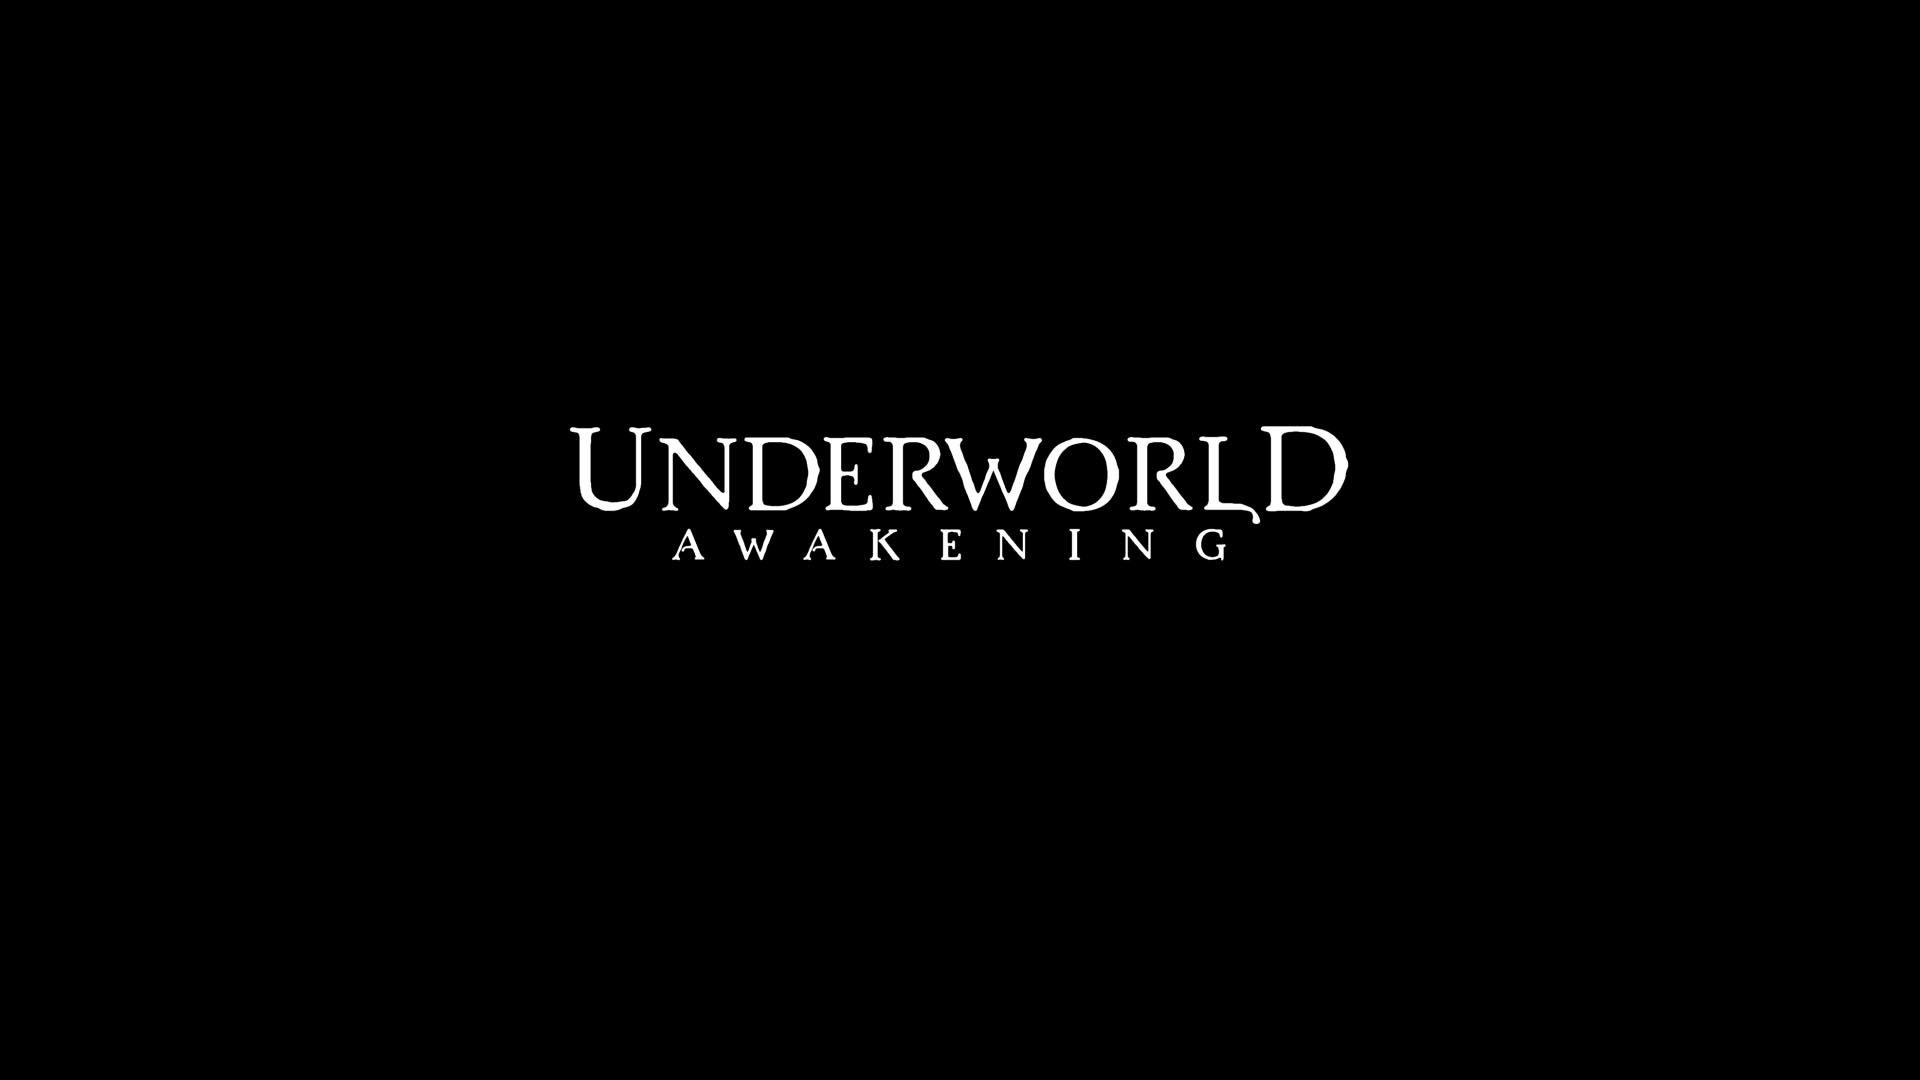 Underworld Awakening Wallpapers Hd For Desktop Backgrounds